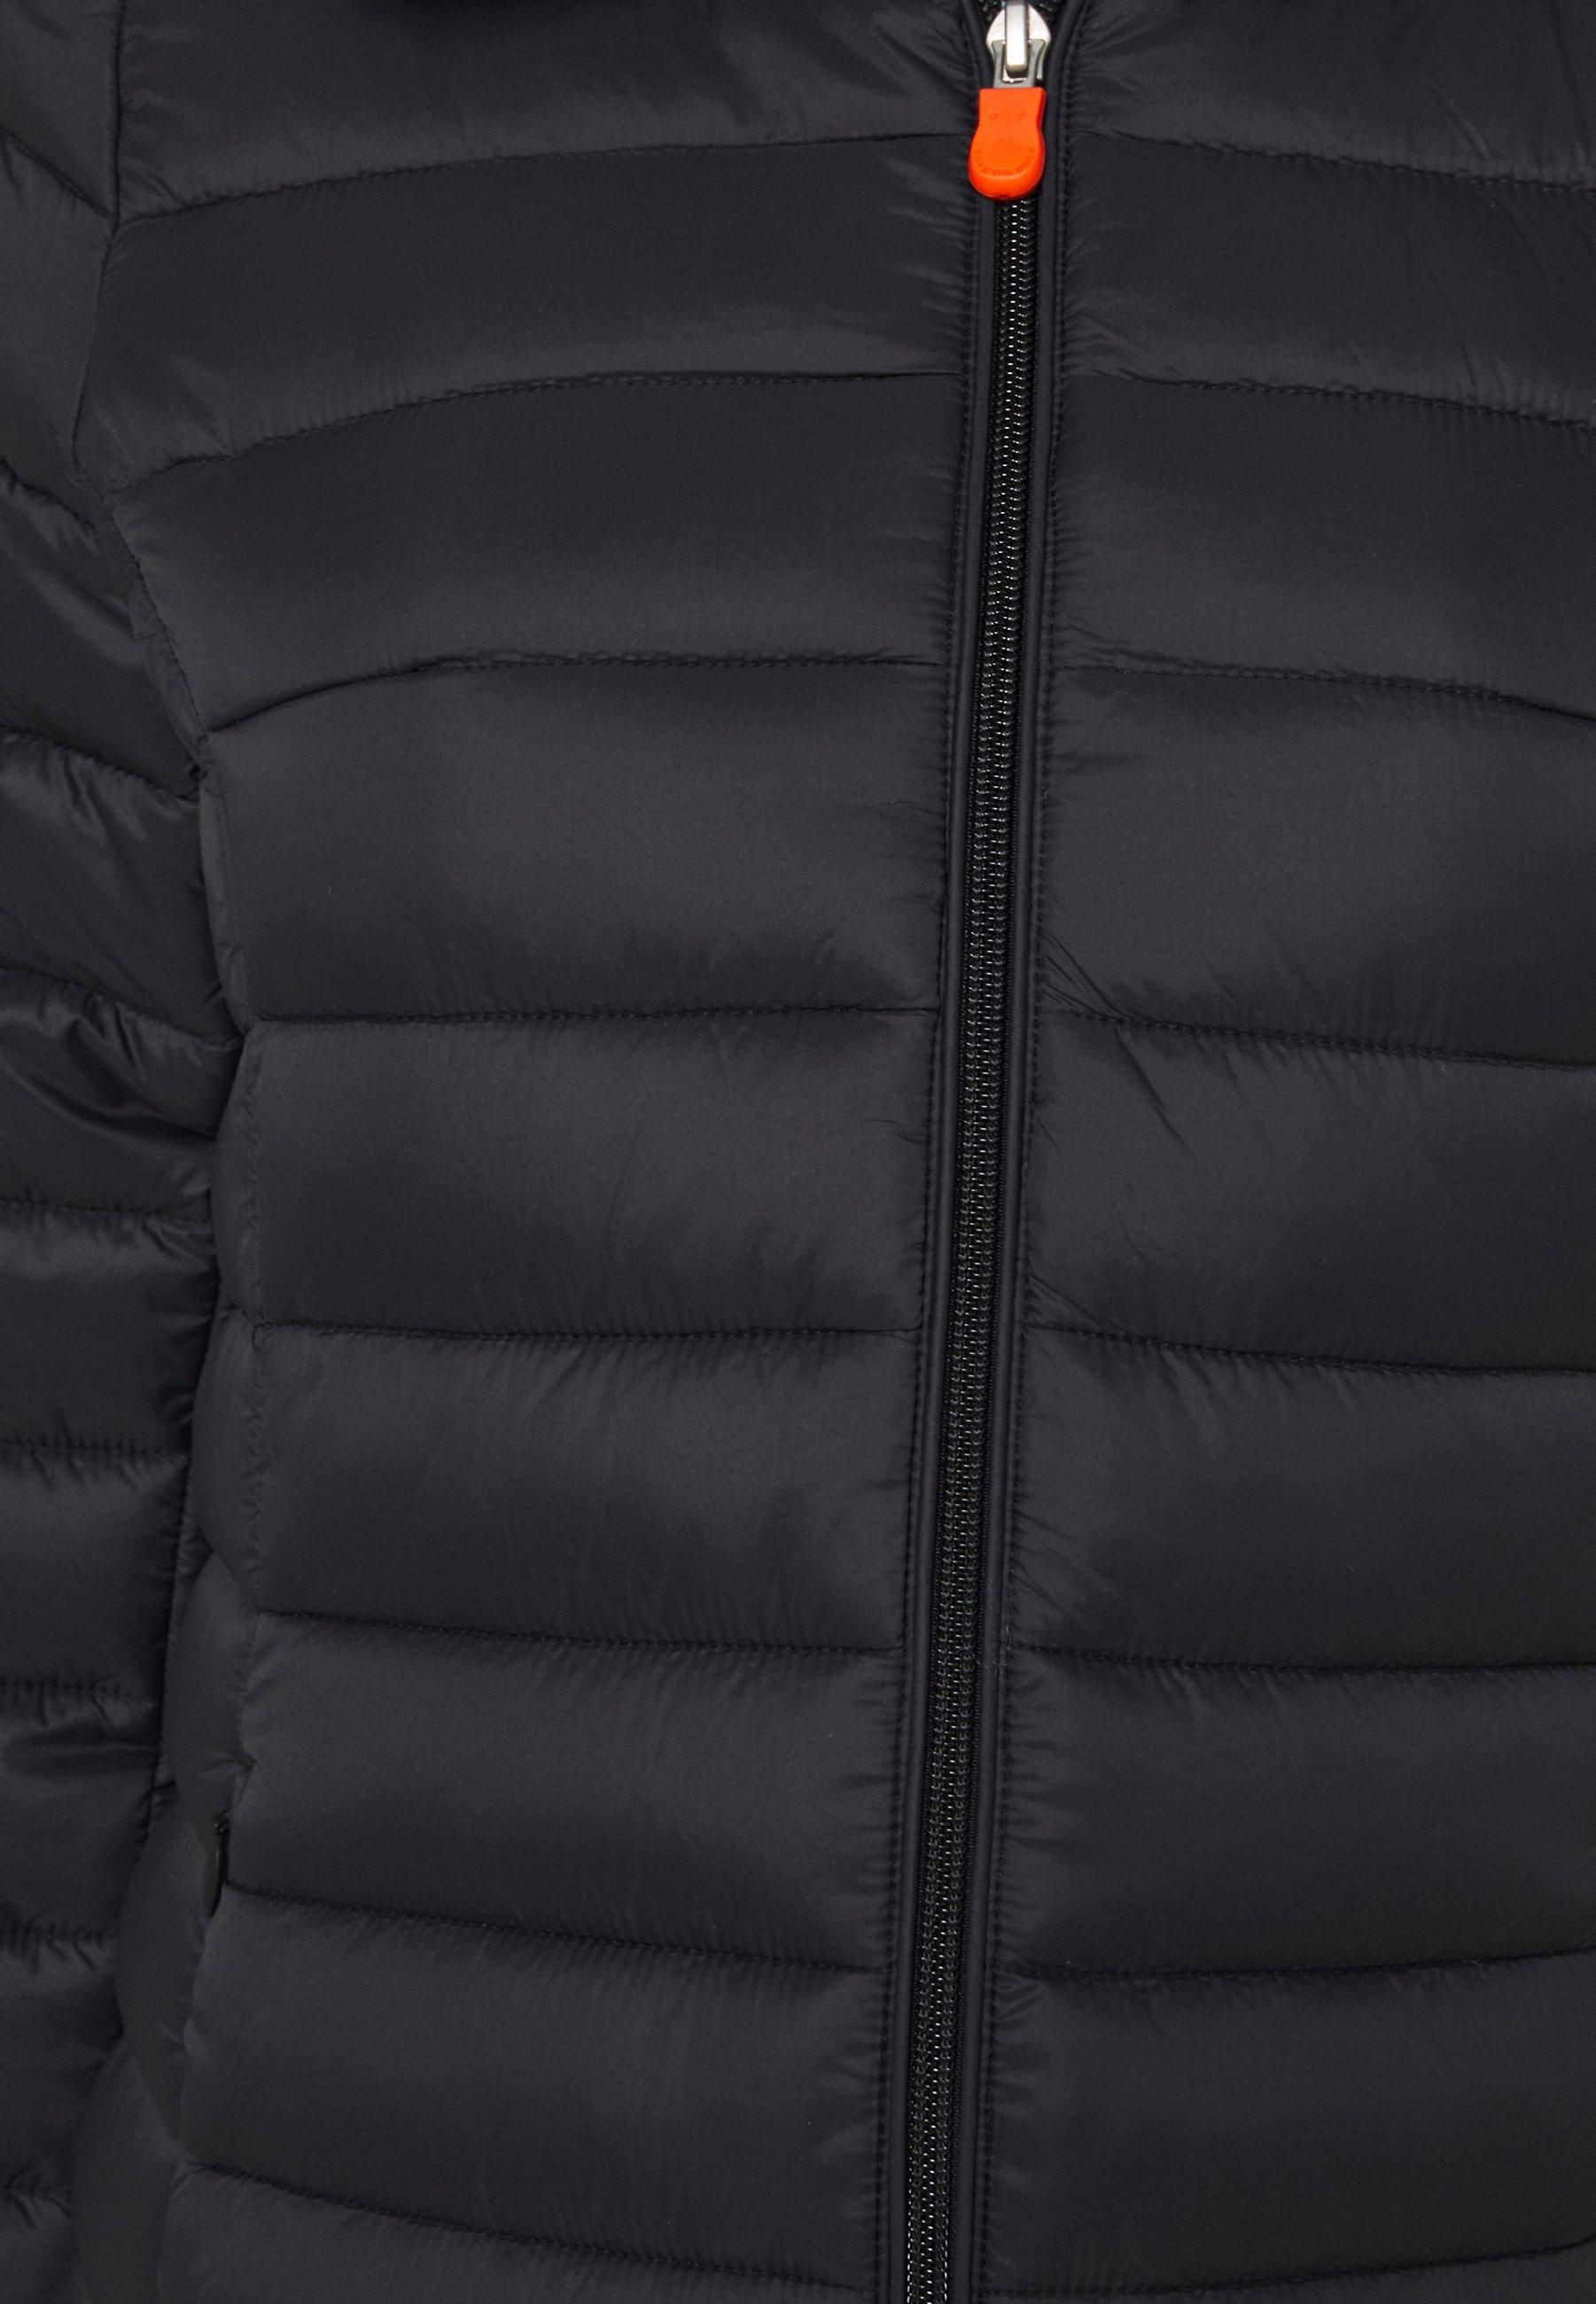 Fast Express Hyper Online Women's Clothing Save the duck GIGAY Winter coat black AGYth8Qs2 GHwEKYNv8